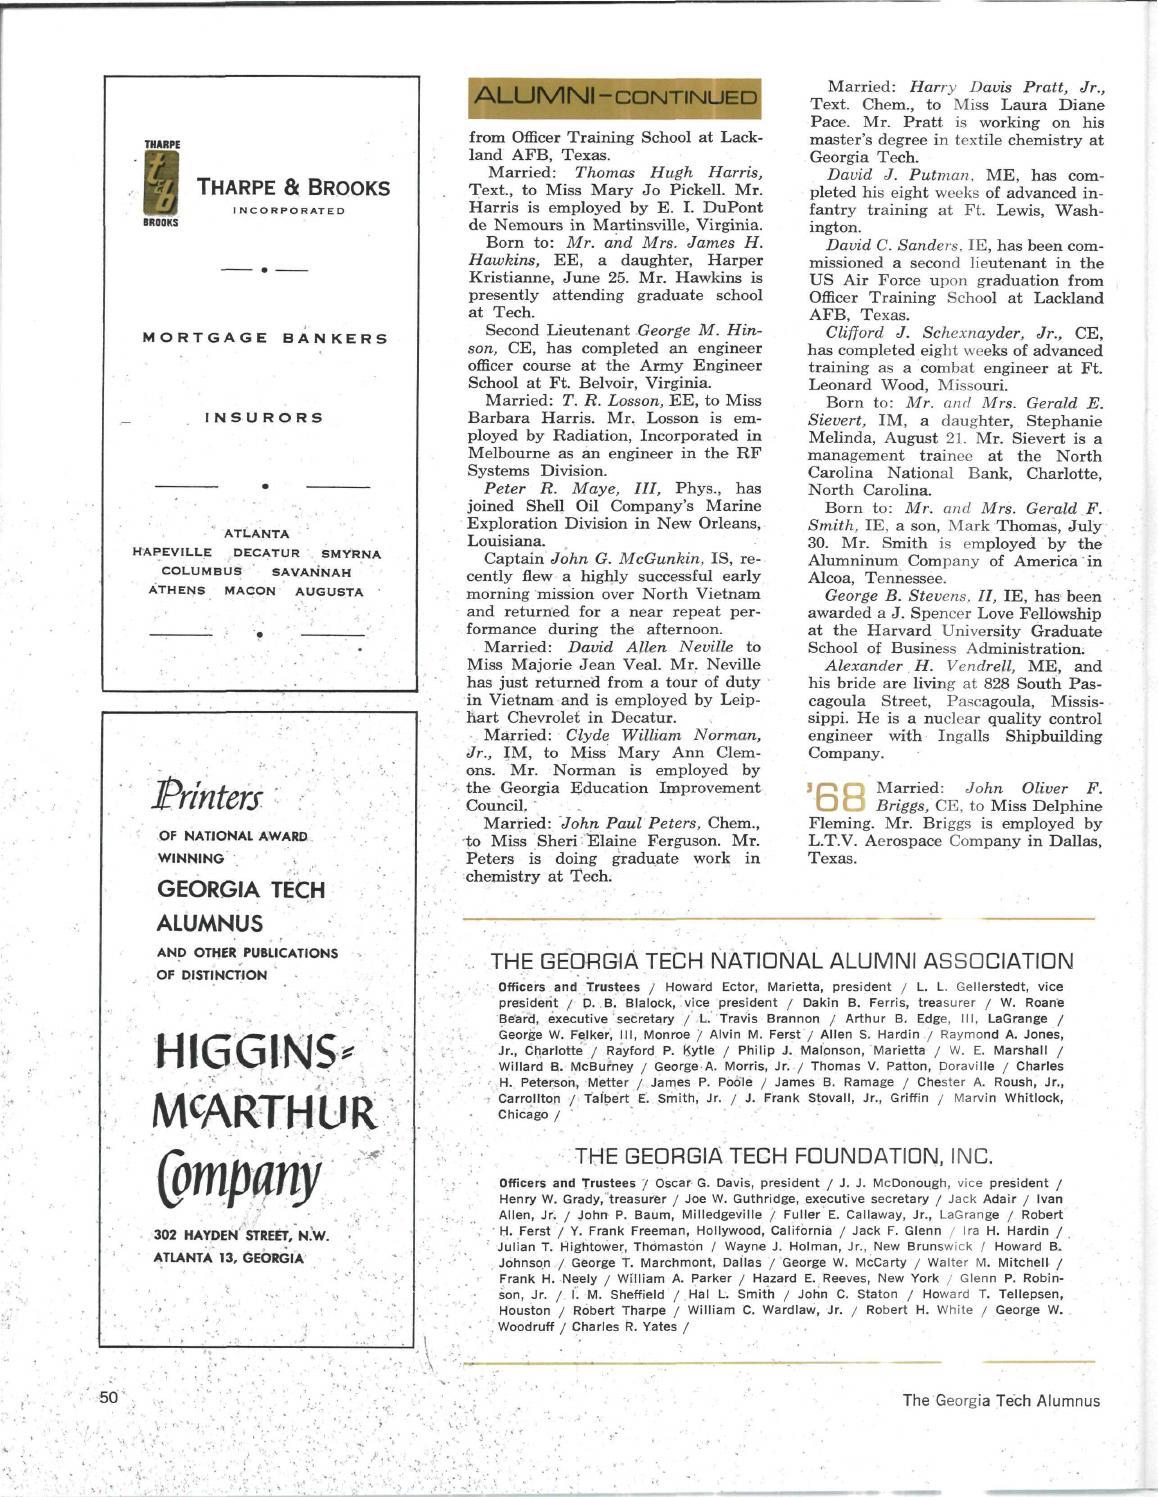 Georgia Tech Alumni Magazine Vol. 46, No. 02 1967 by